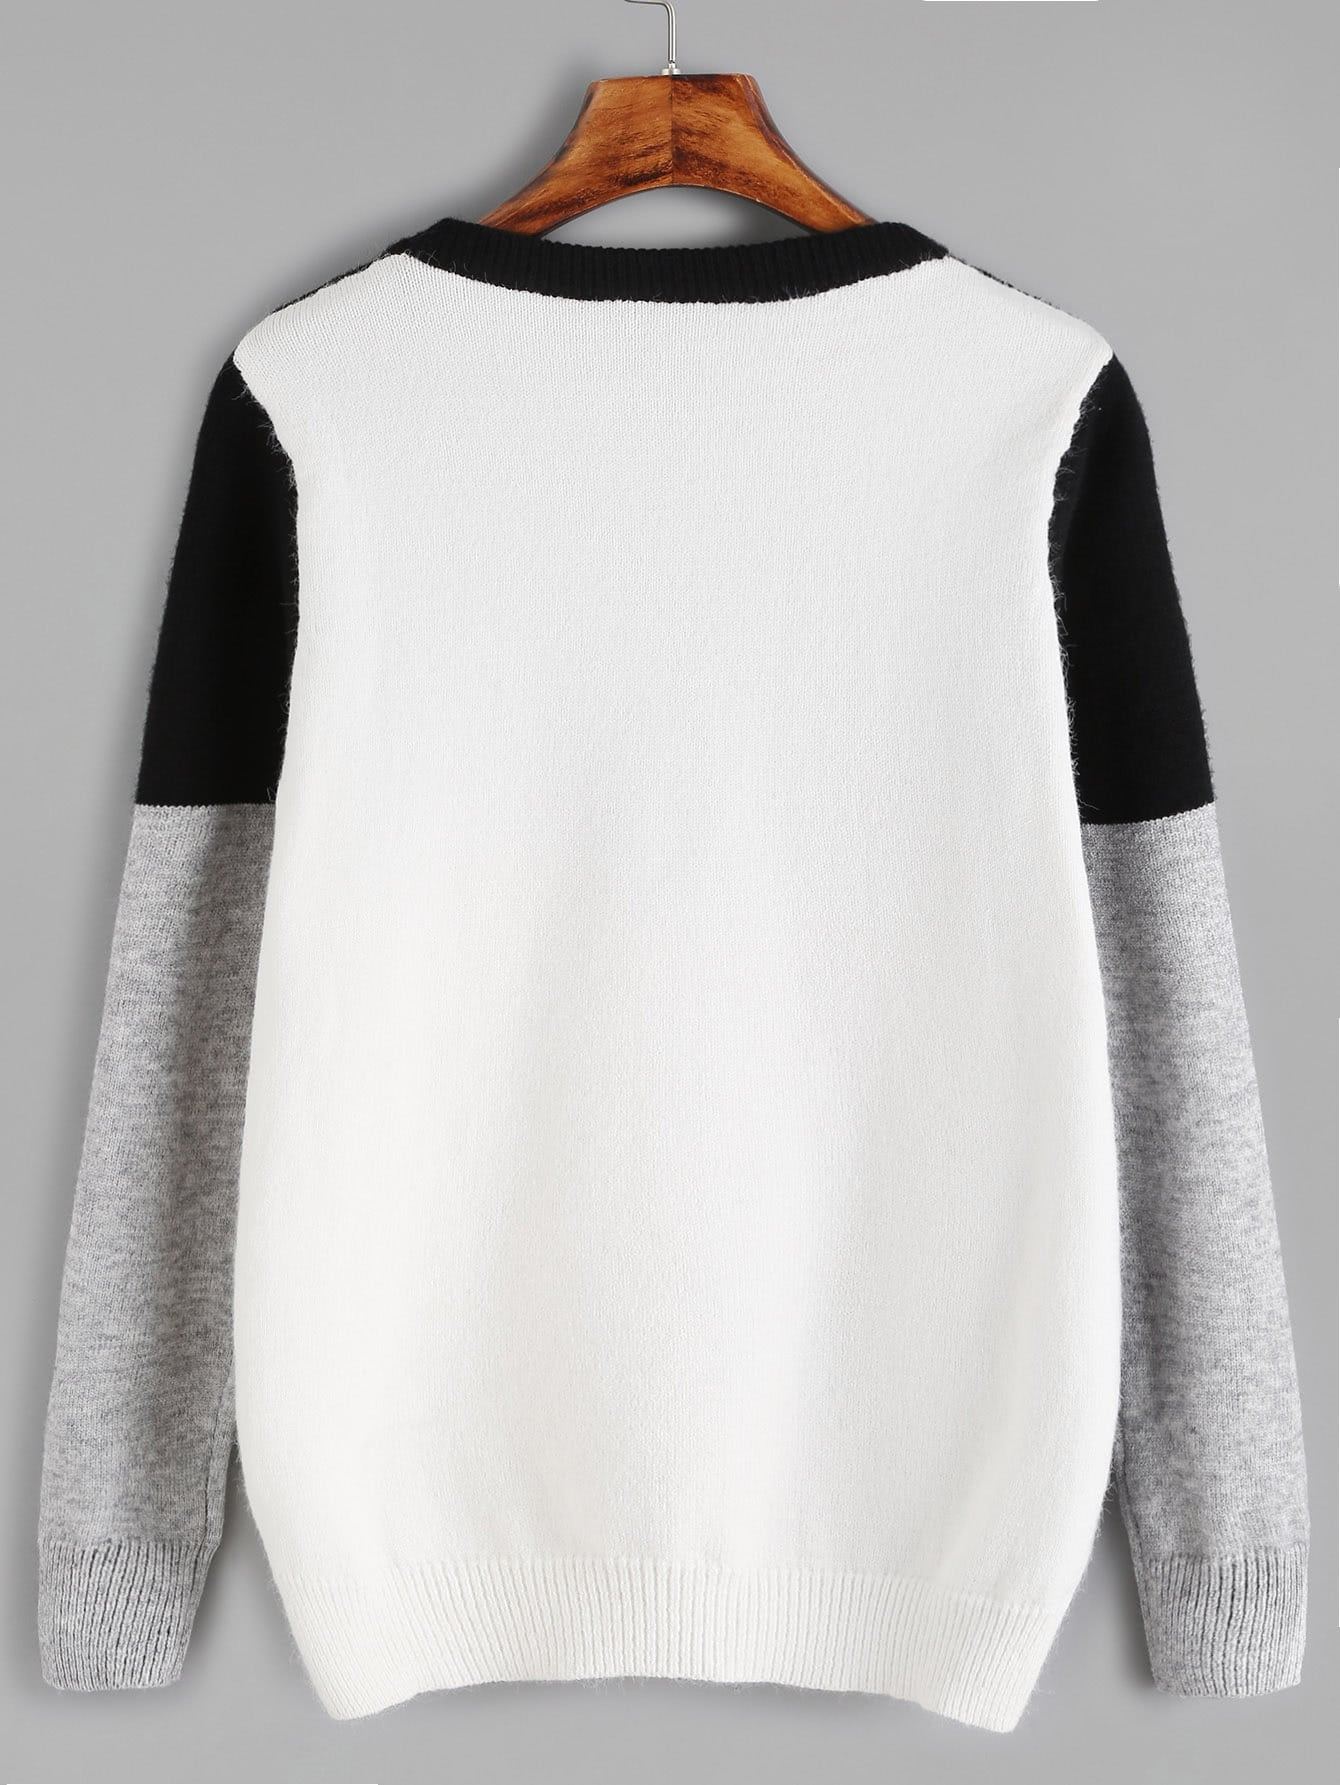 sweater160926301_2